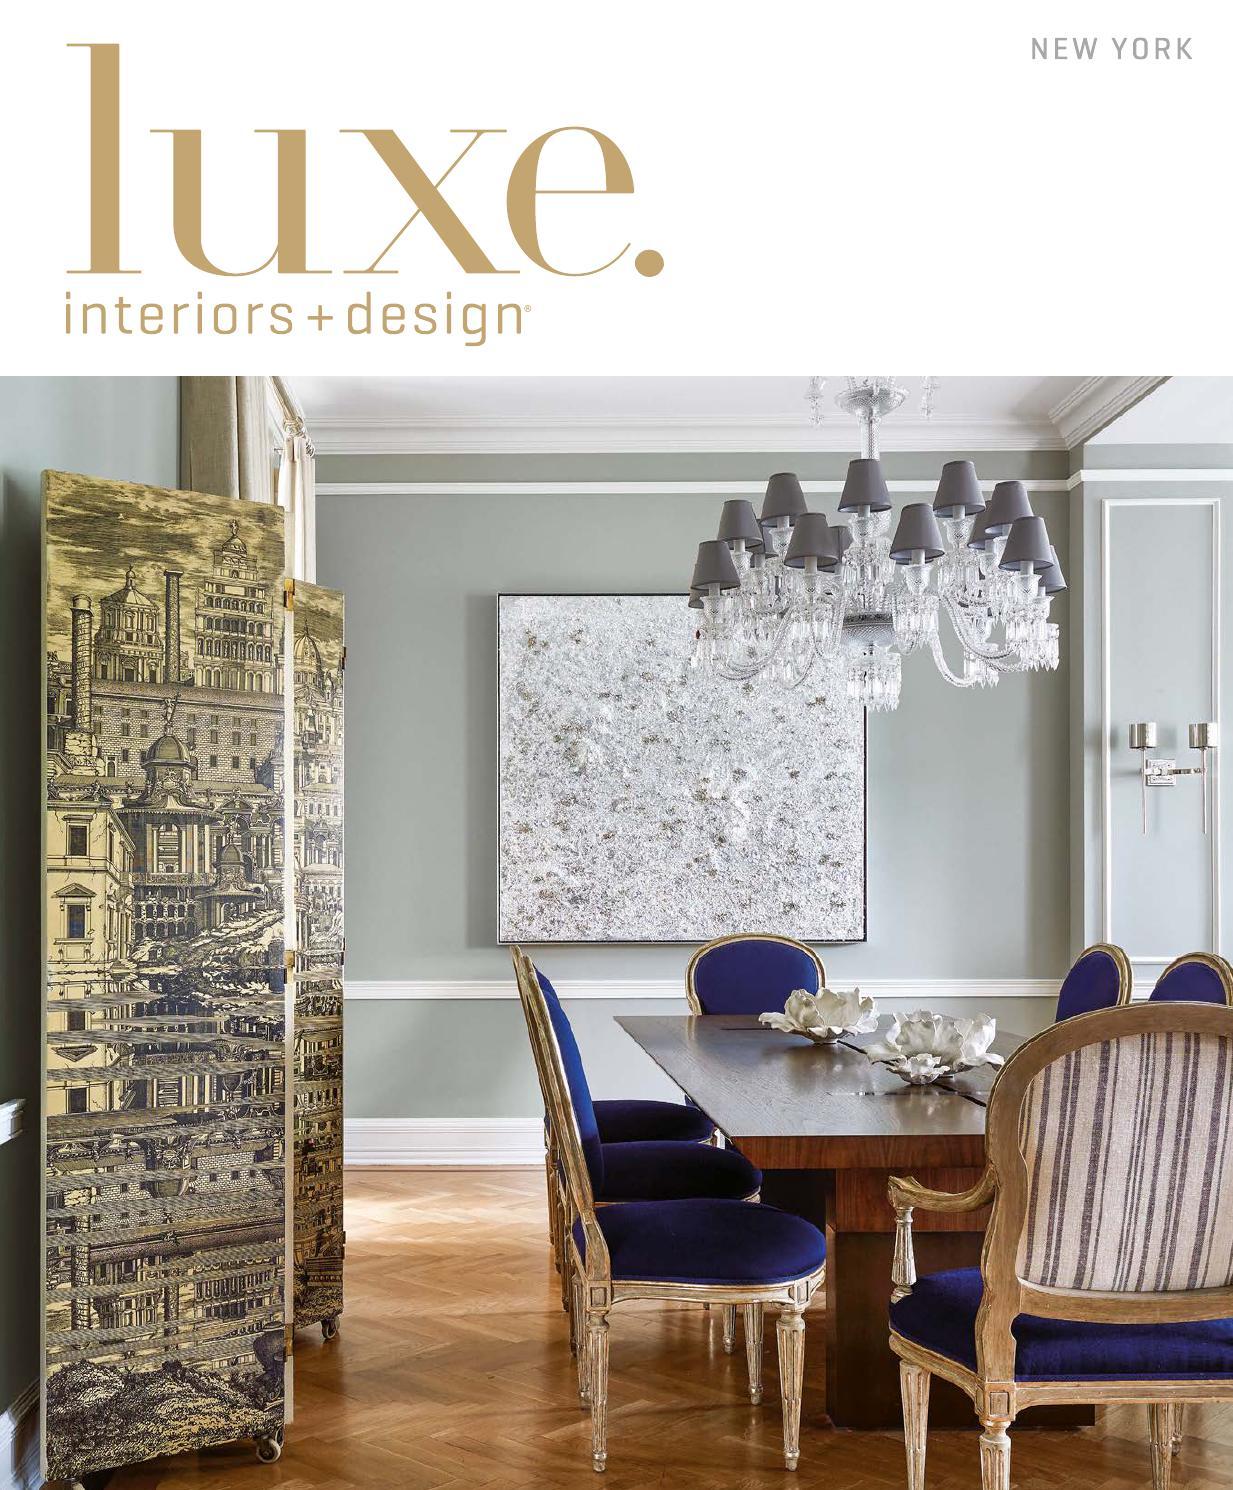 luxe magazine november 2015 new york by sandow issuu. Black Bedroom Furniture Sets. Home Design Ideas